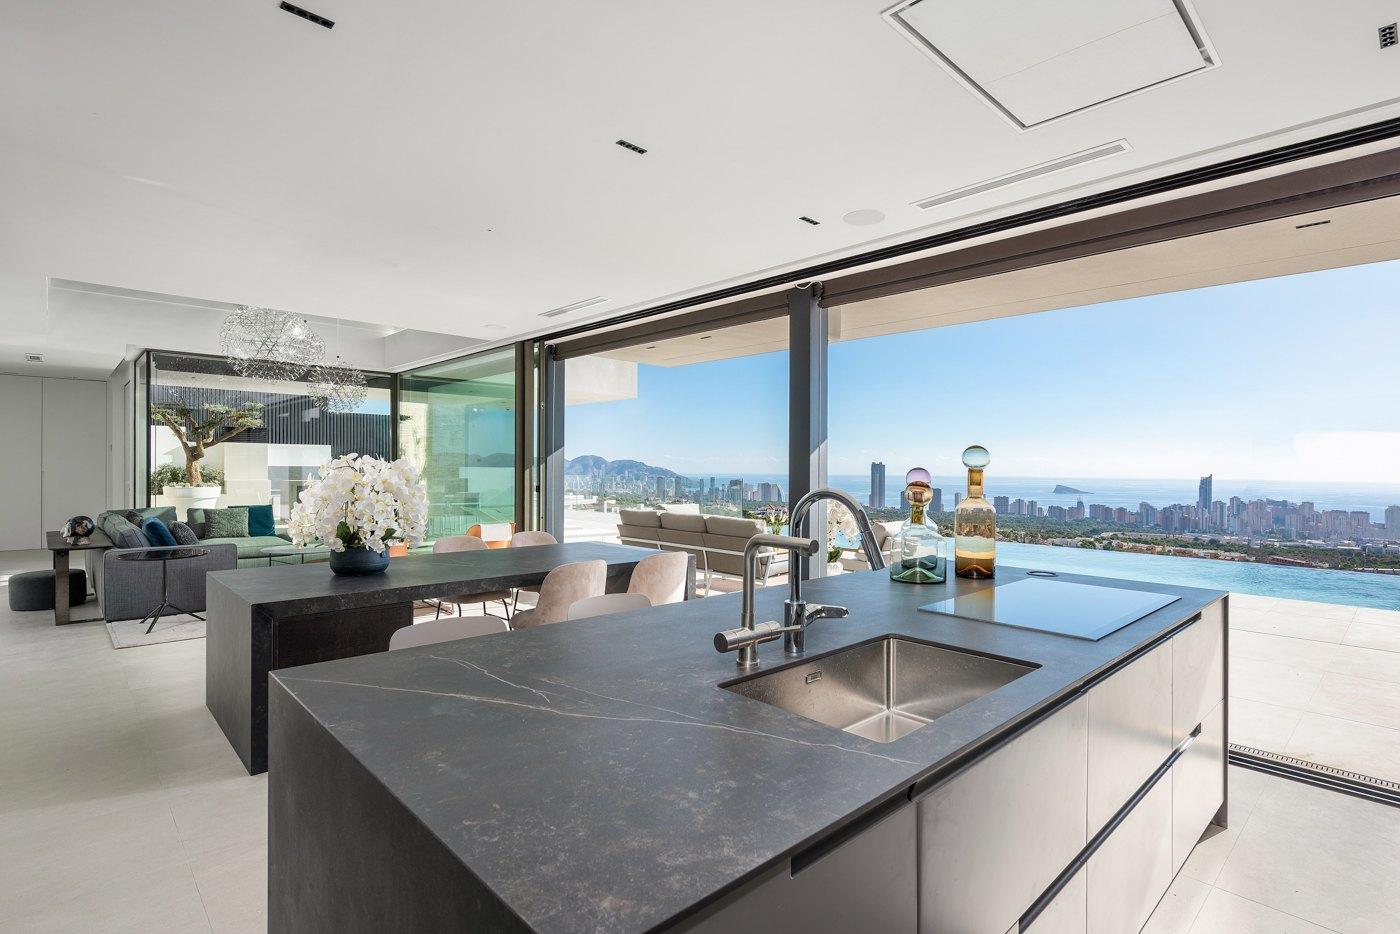 Modern new build villa for sale in Finestrat Sierra Cortina with sea views